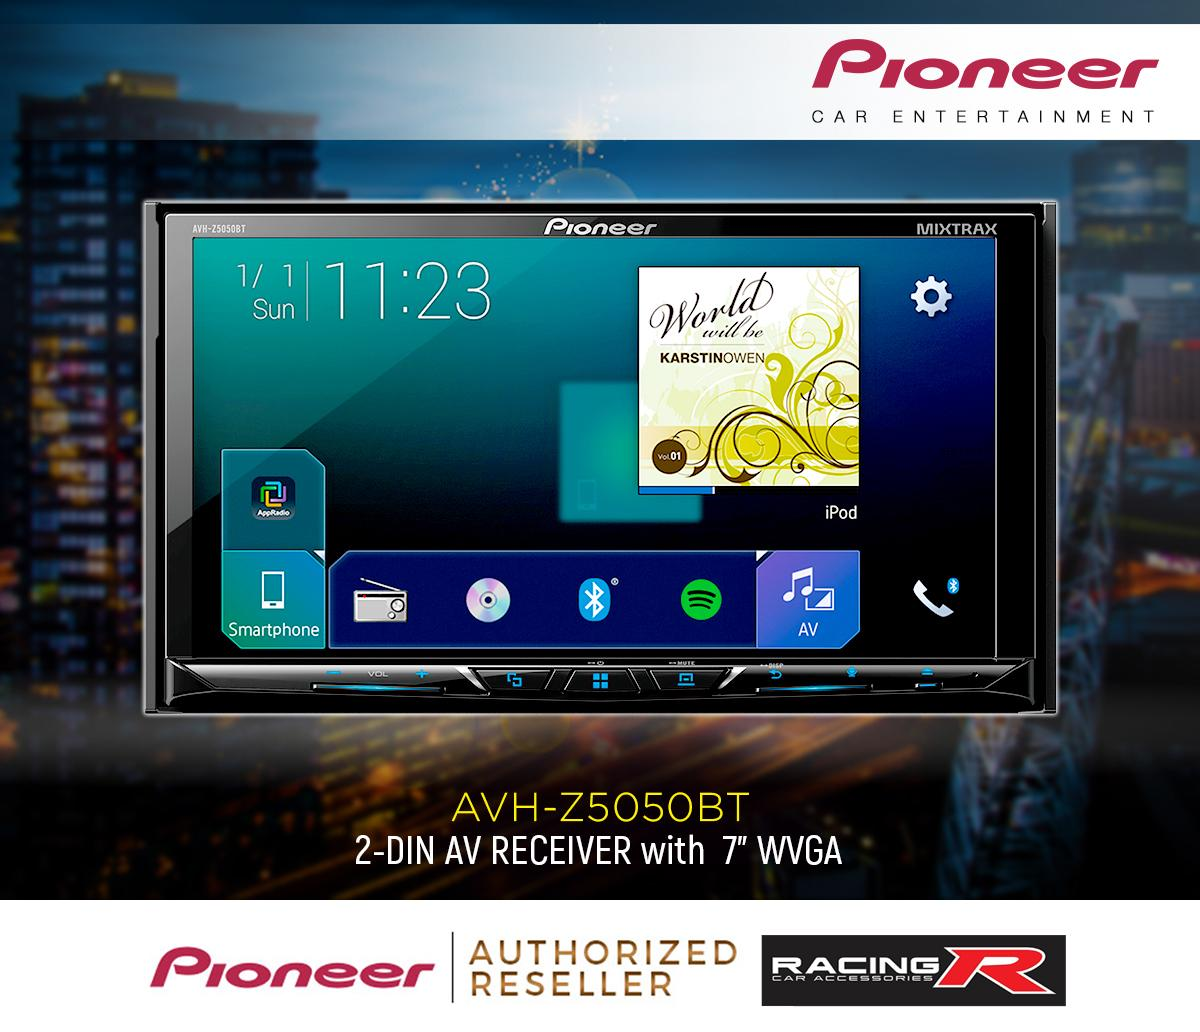 Pioneer AVH-Z5050BT Car Stereo DVD RDS AV Receiver ( Car Accessories )